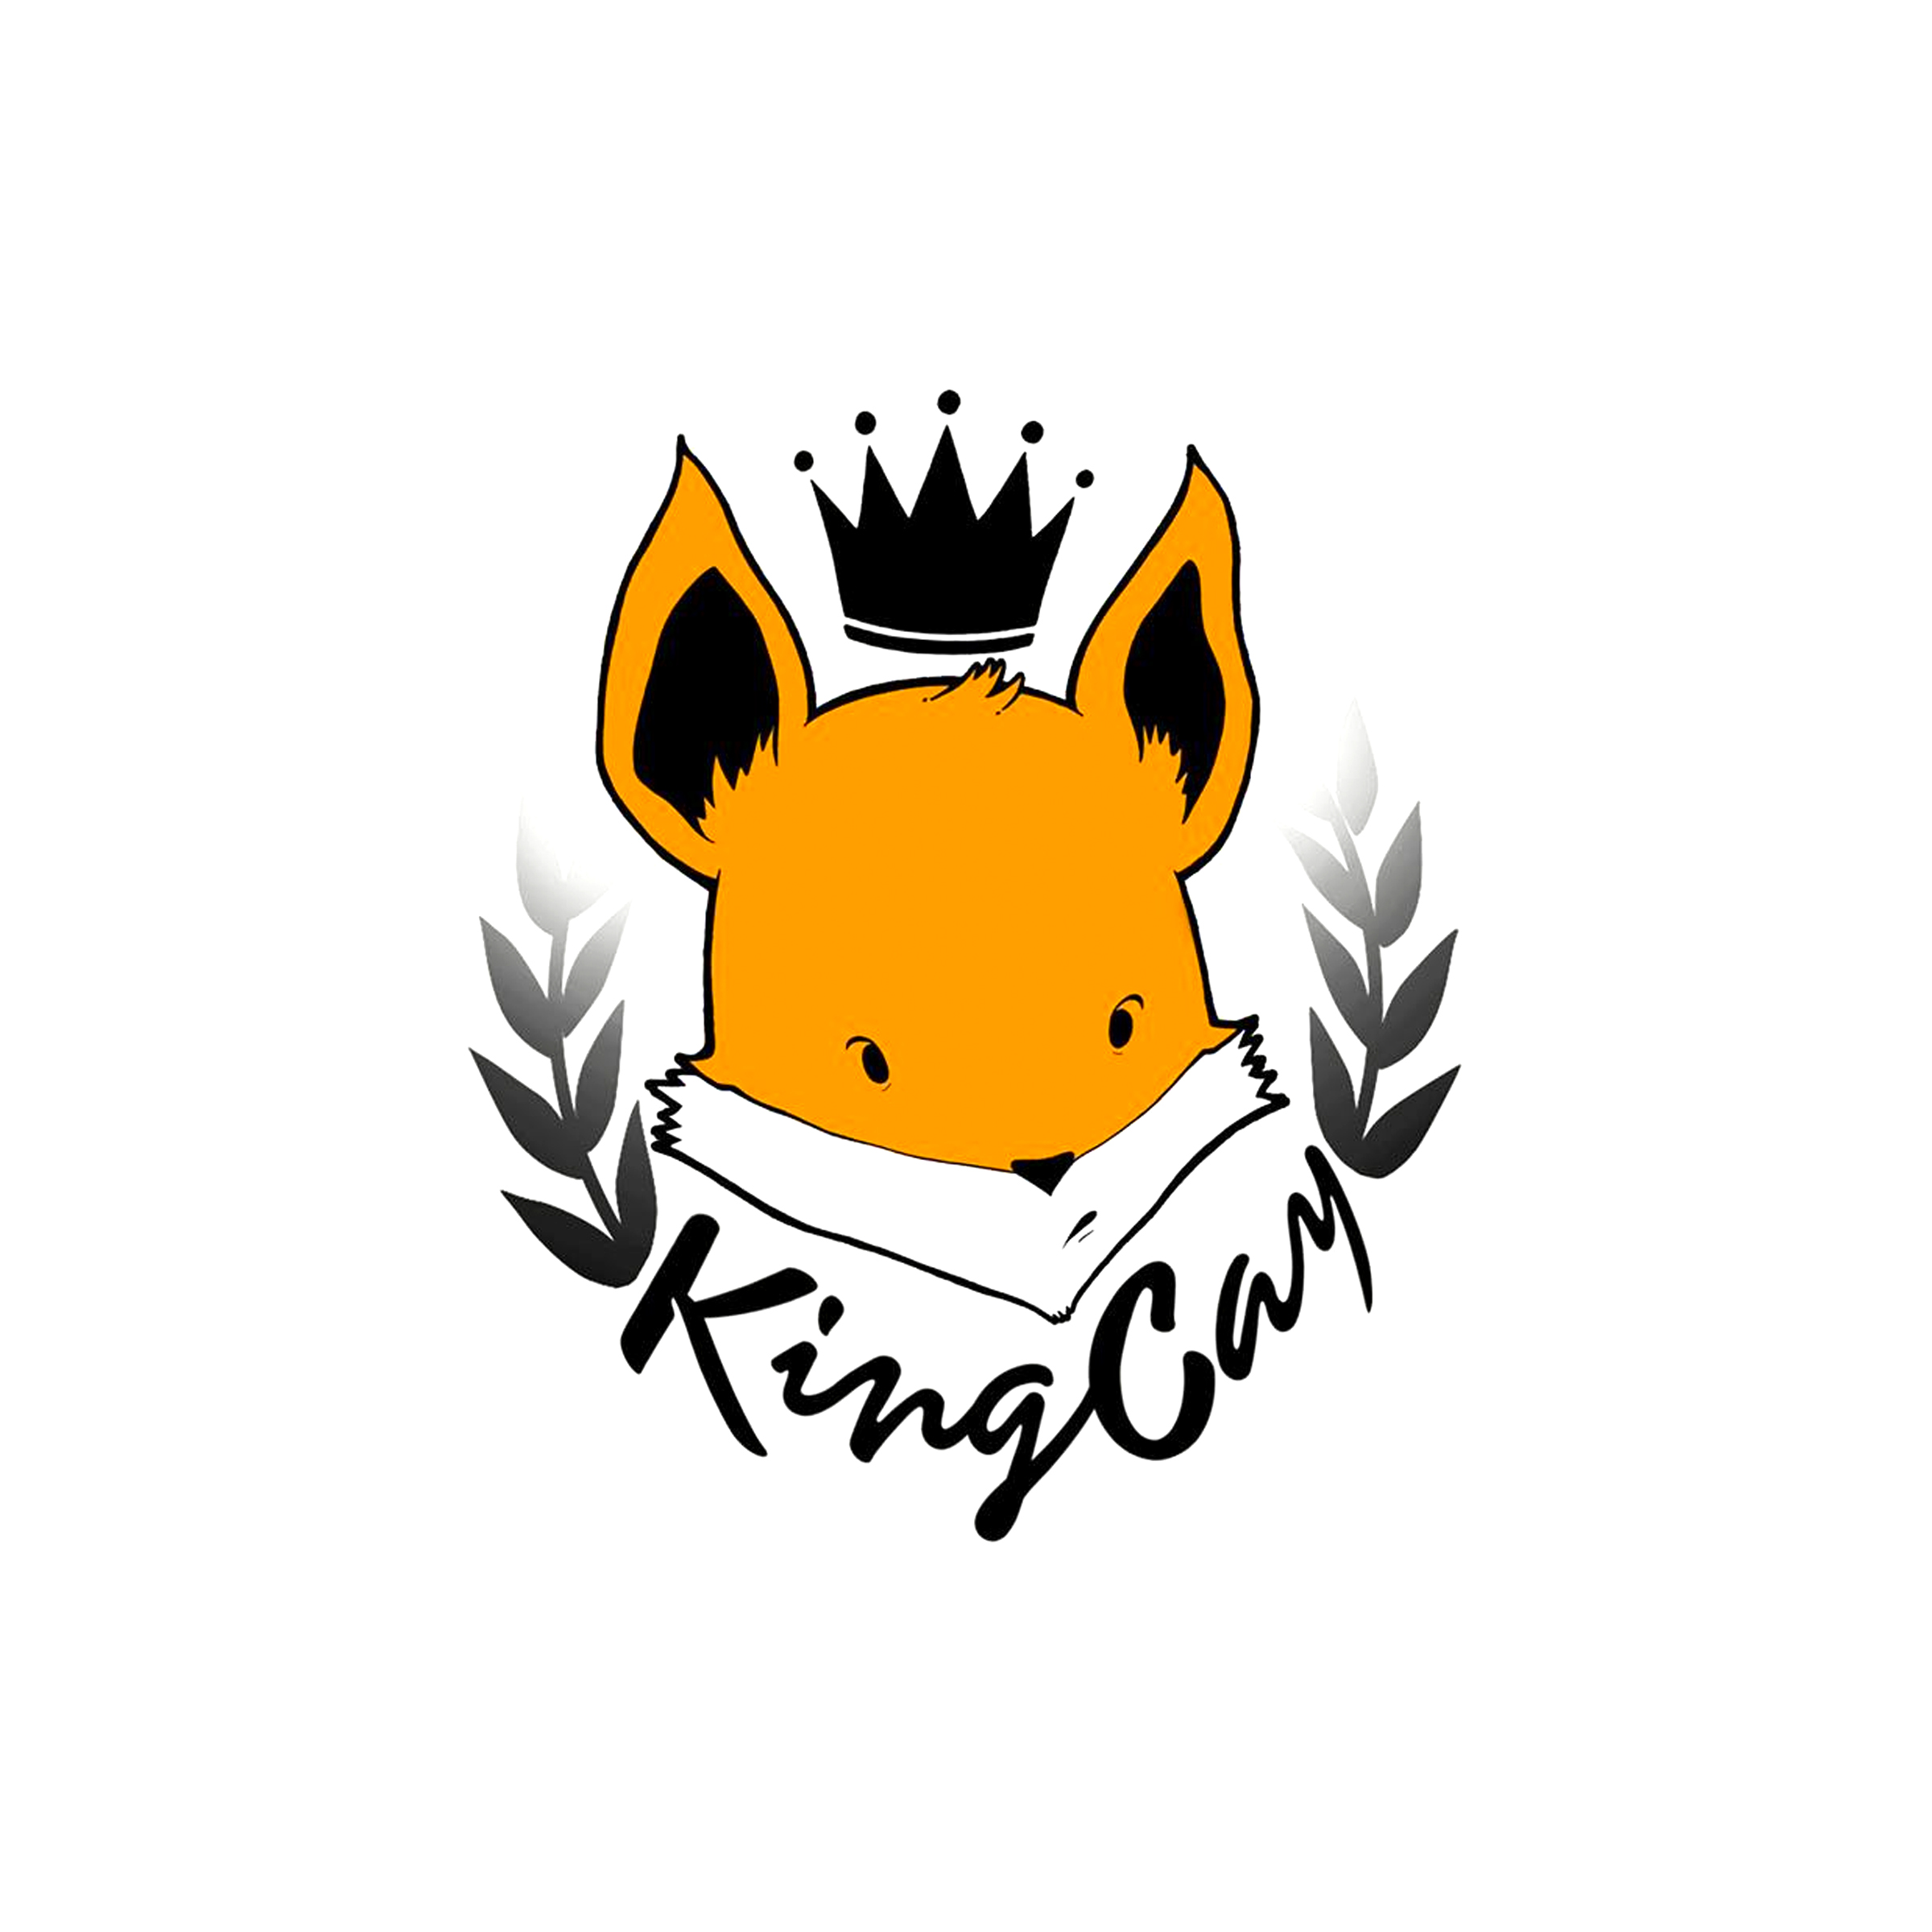 KingCayLogo1.jpg